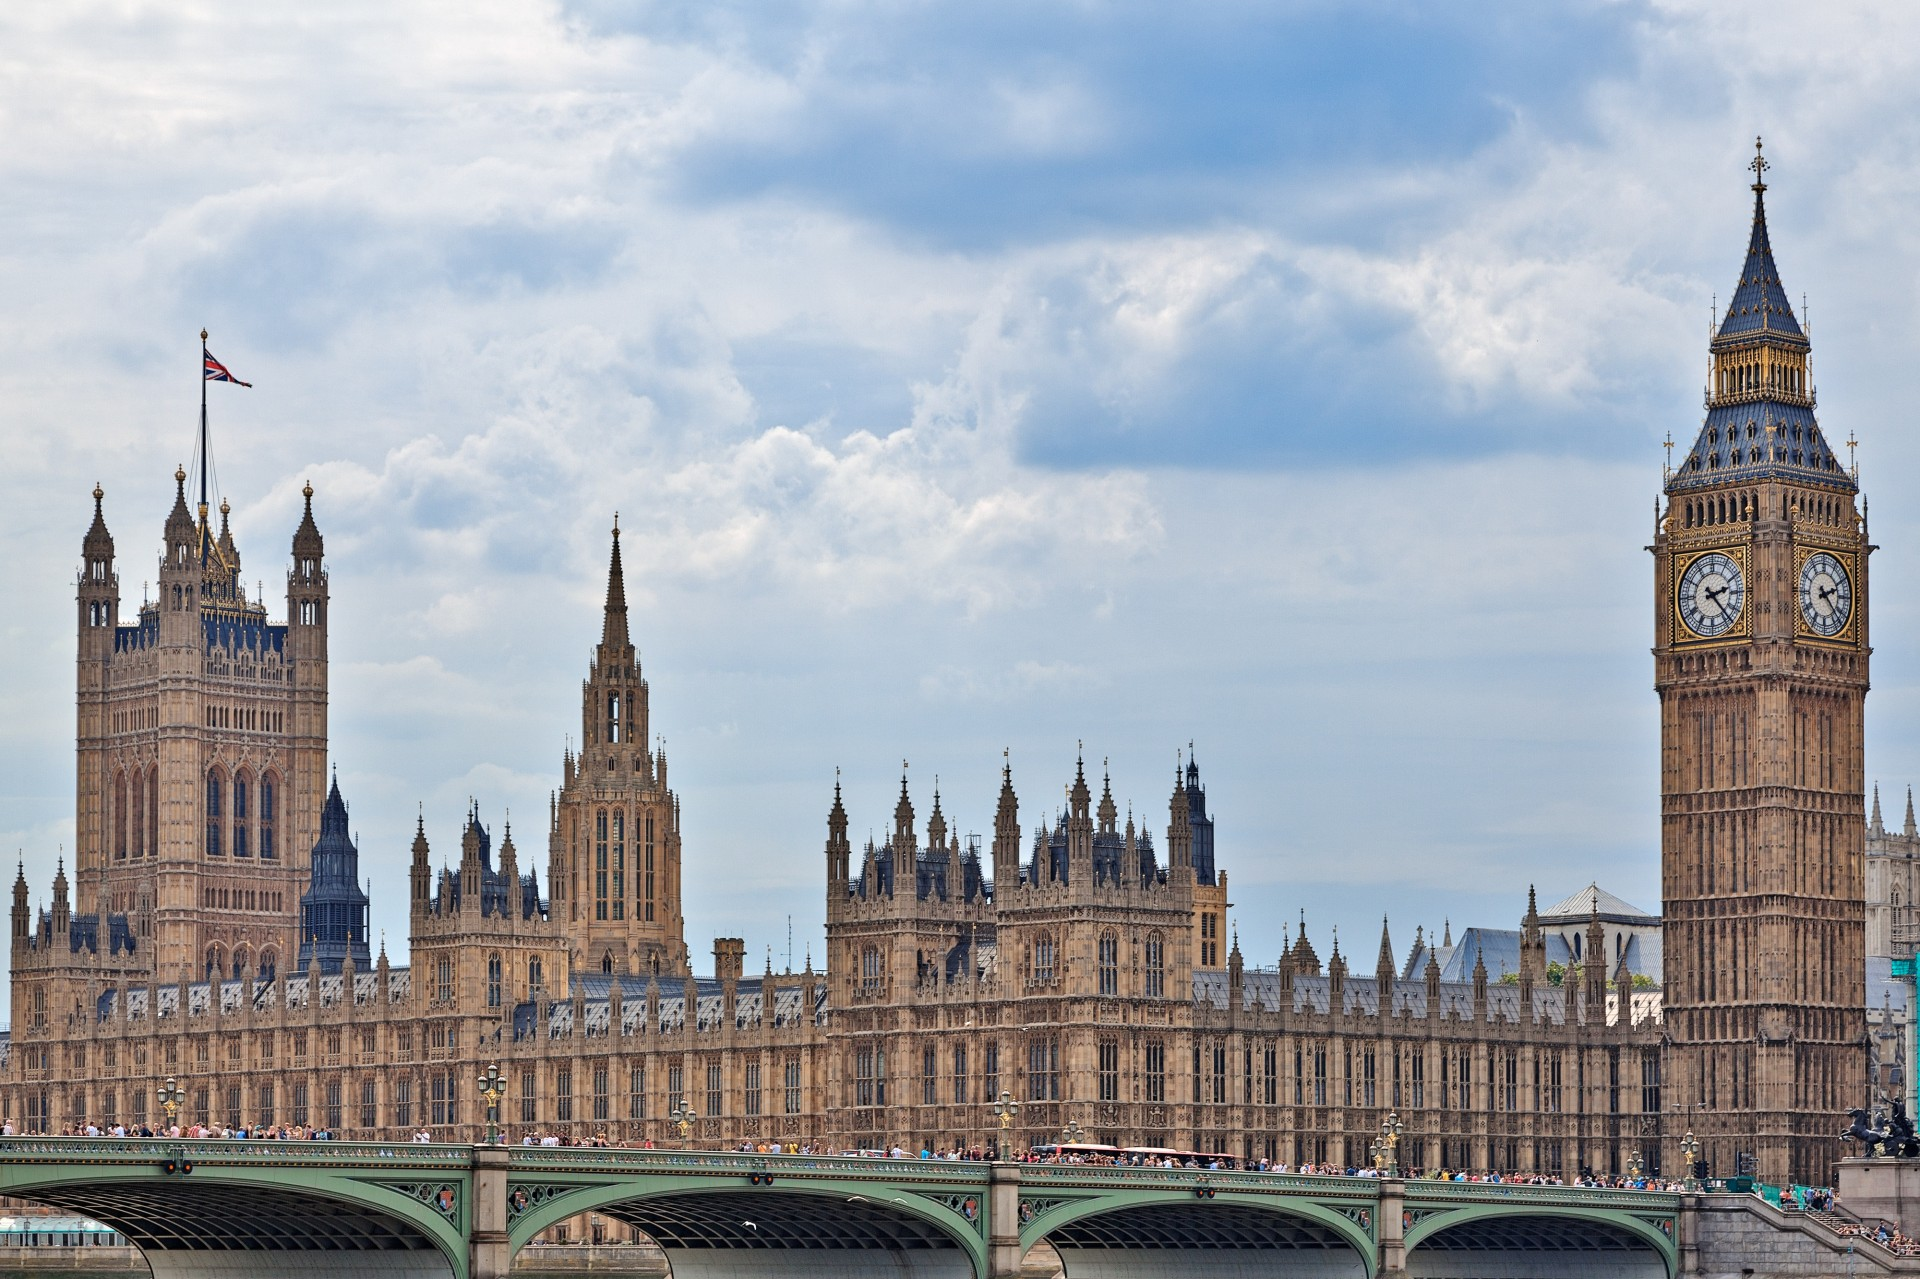 london-parliament-and-big-ben.jpg